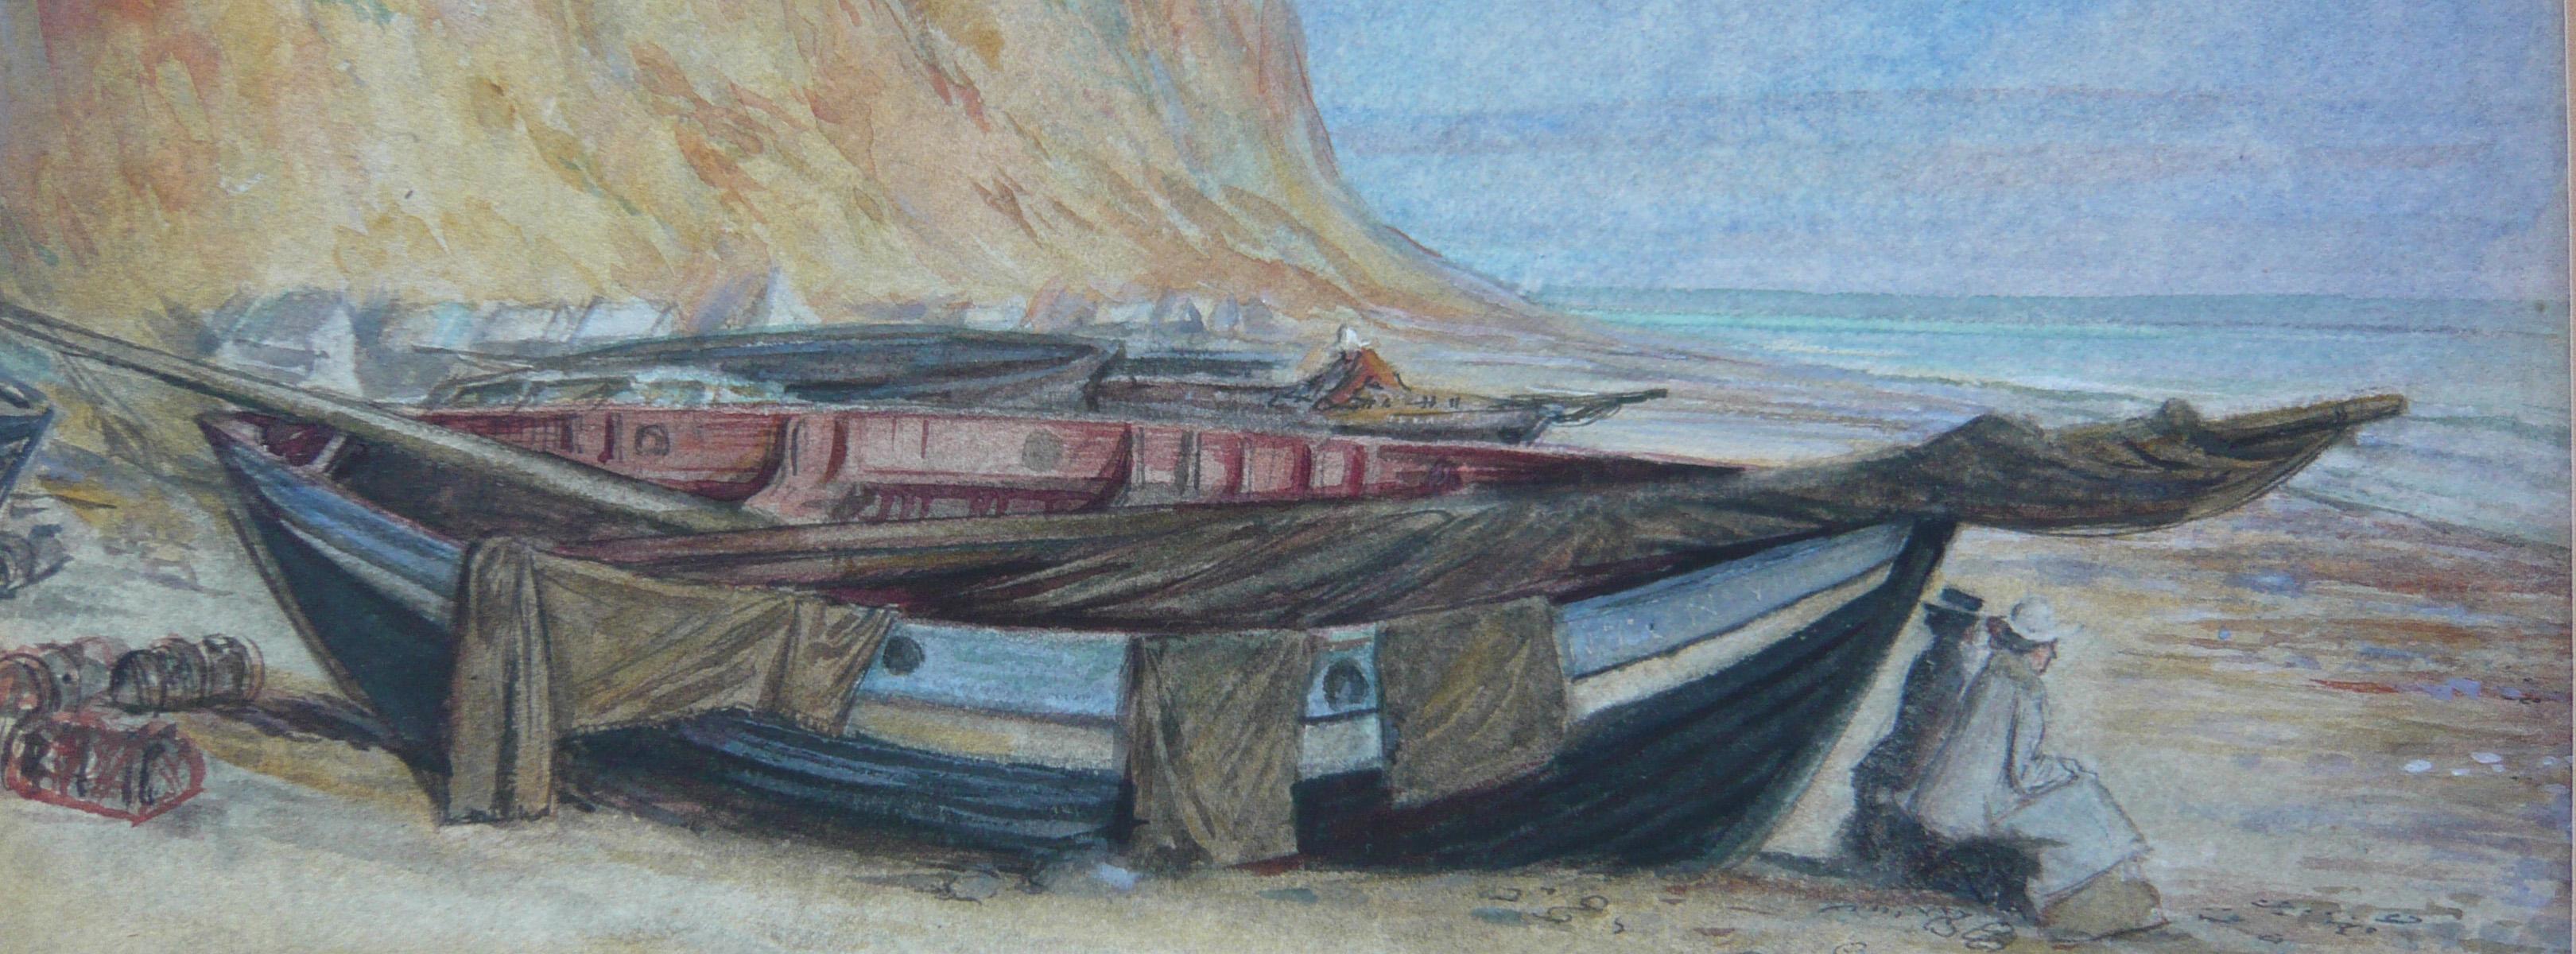 paper conservator watercolour Herbert Cole boats